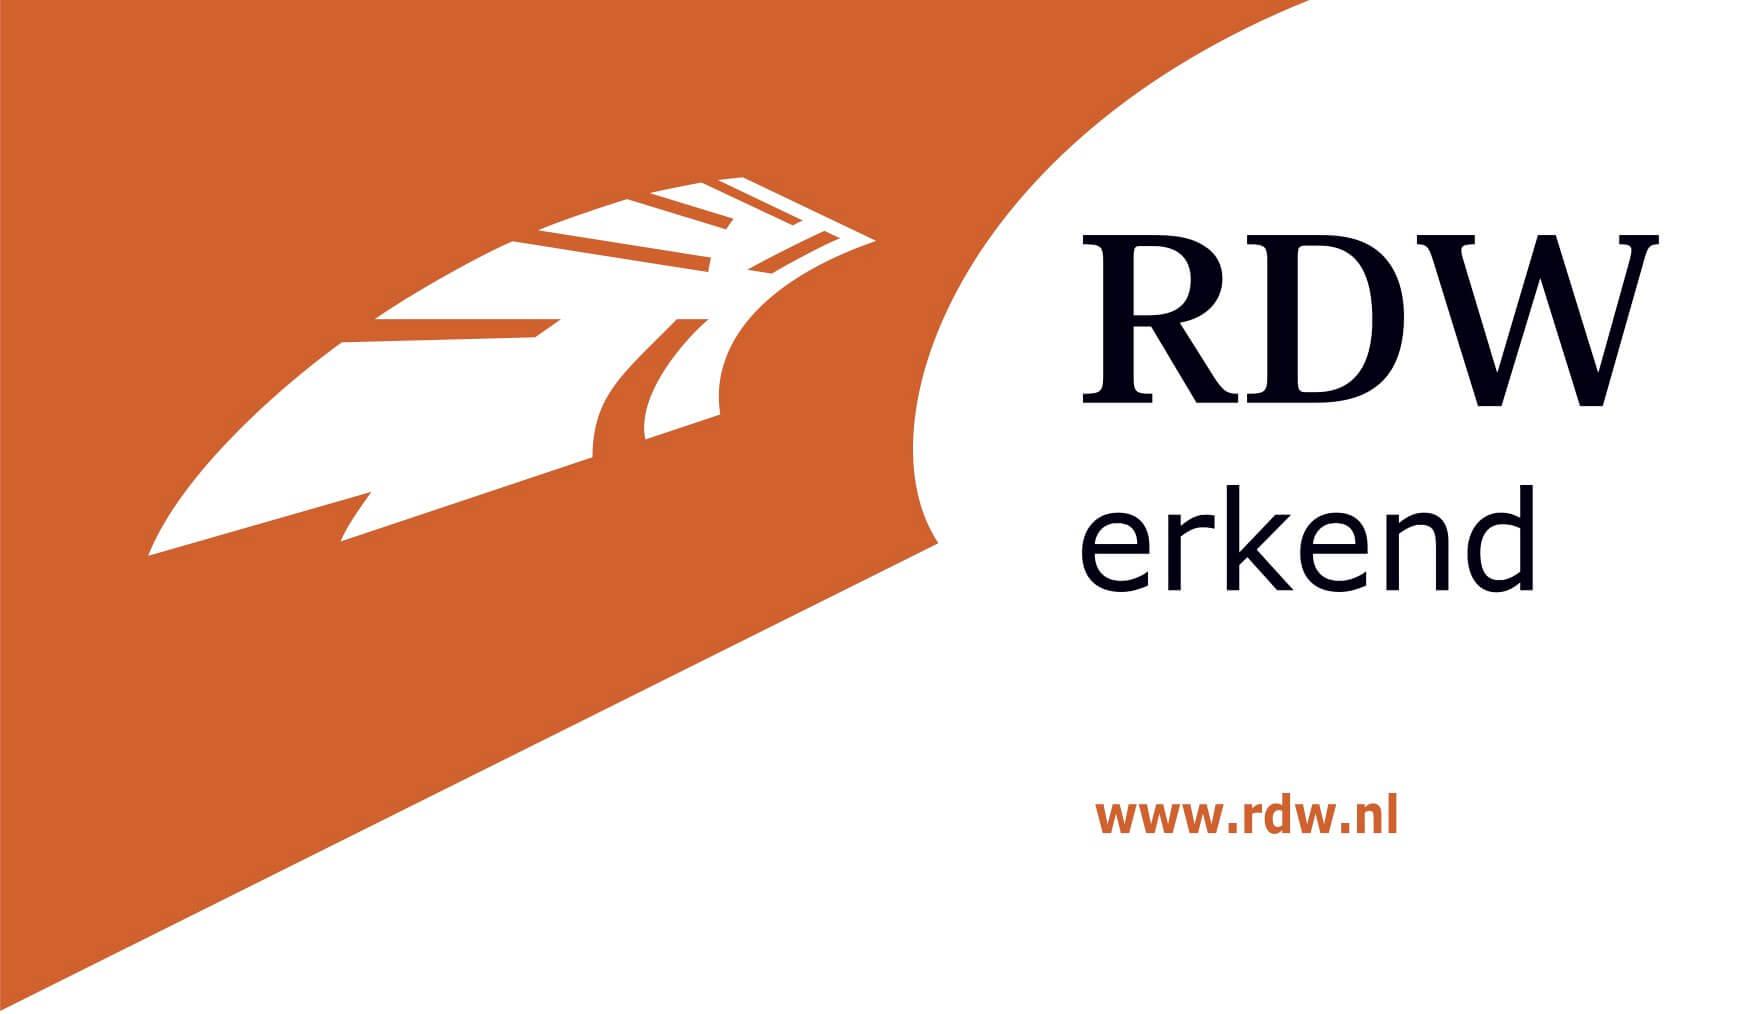 RDW erkend MeboCars